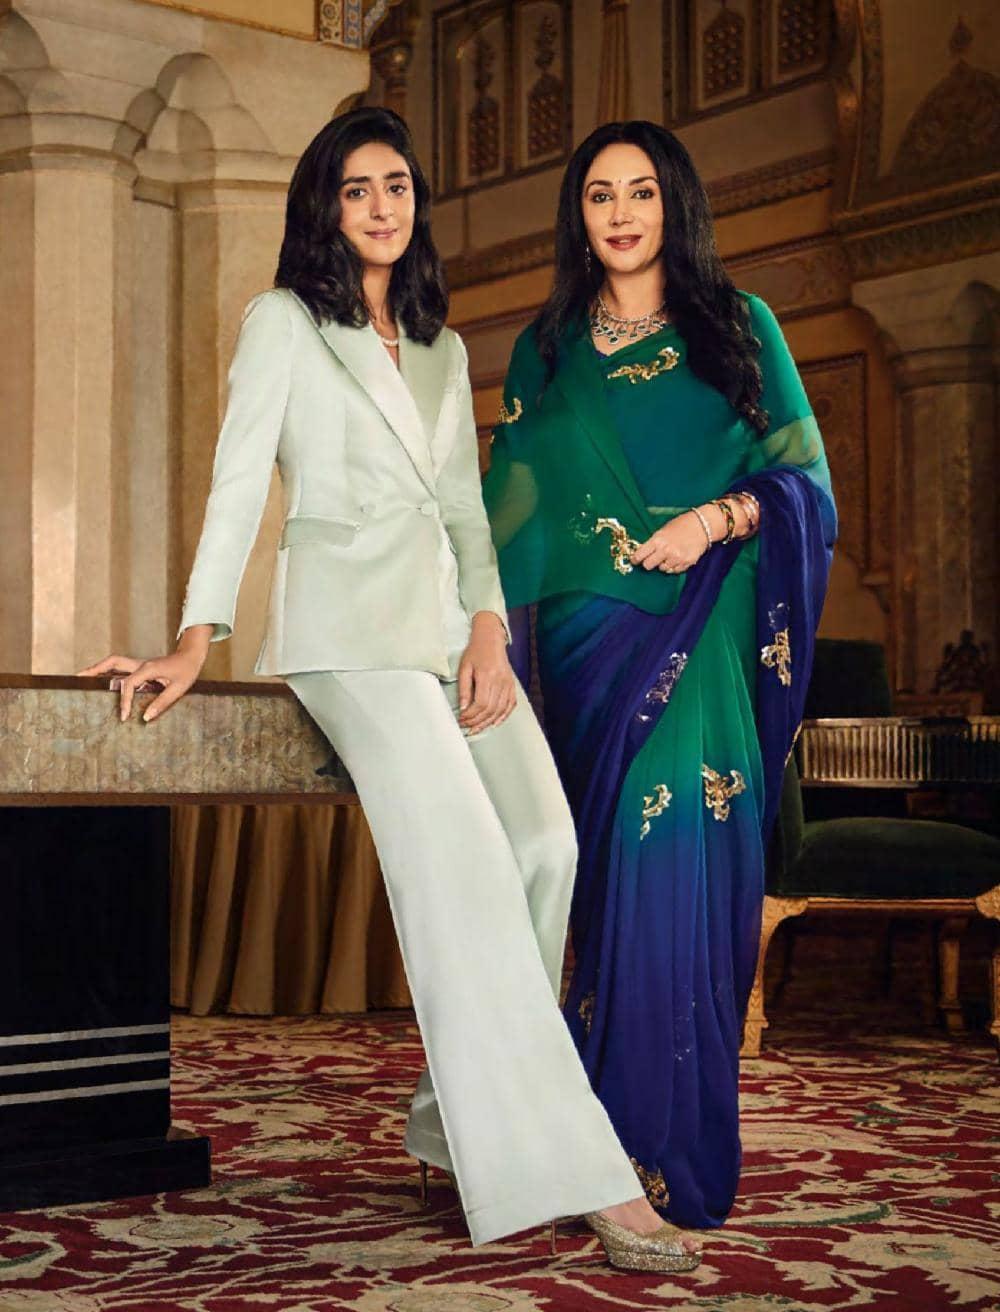 India's Most Beautiful Women Who Shine Through Their Souls